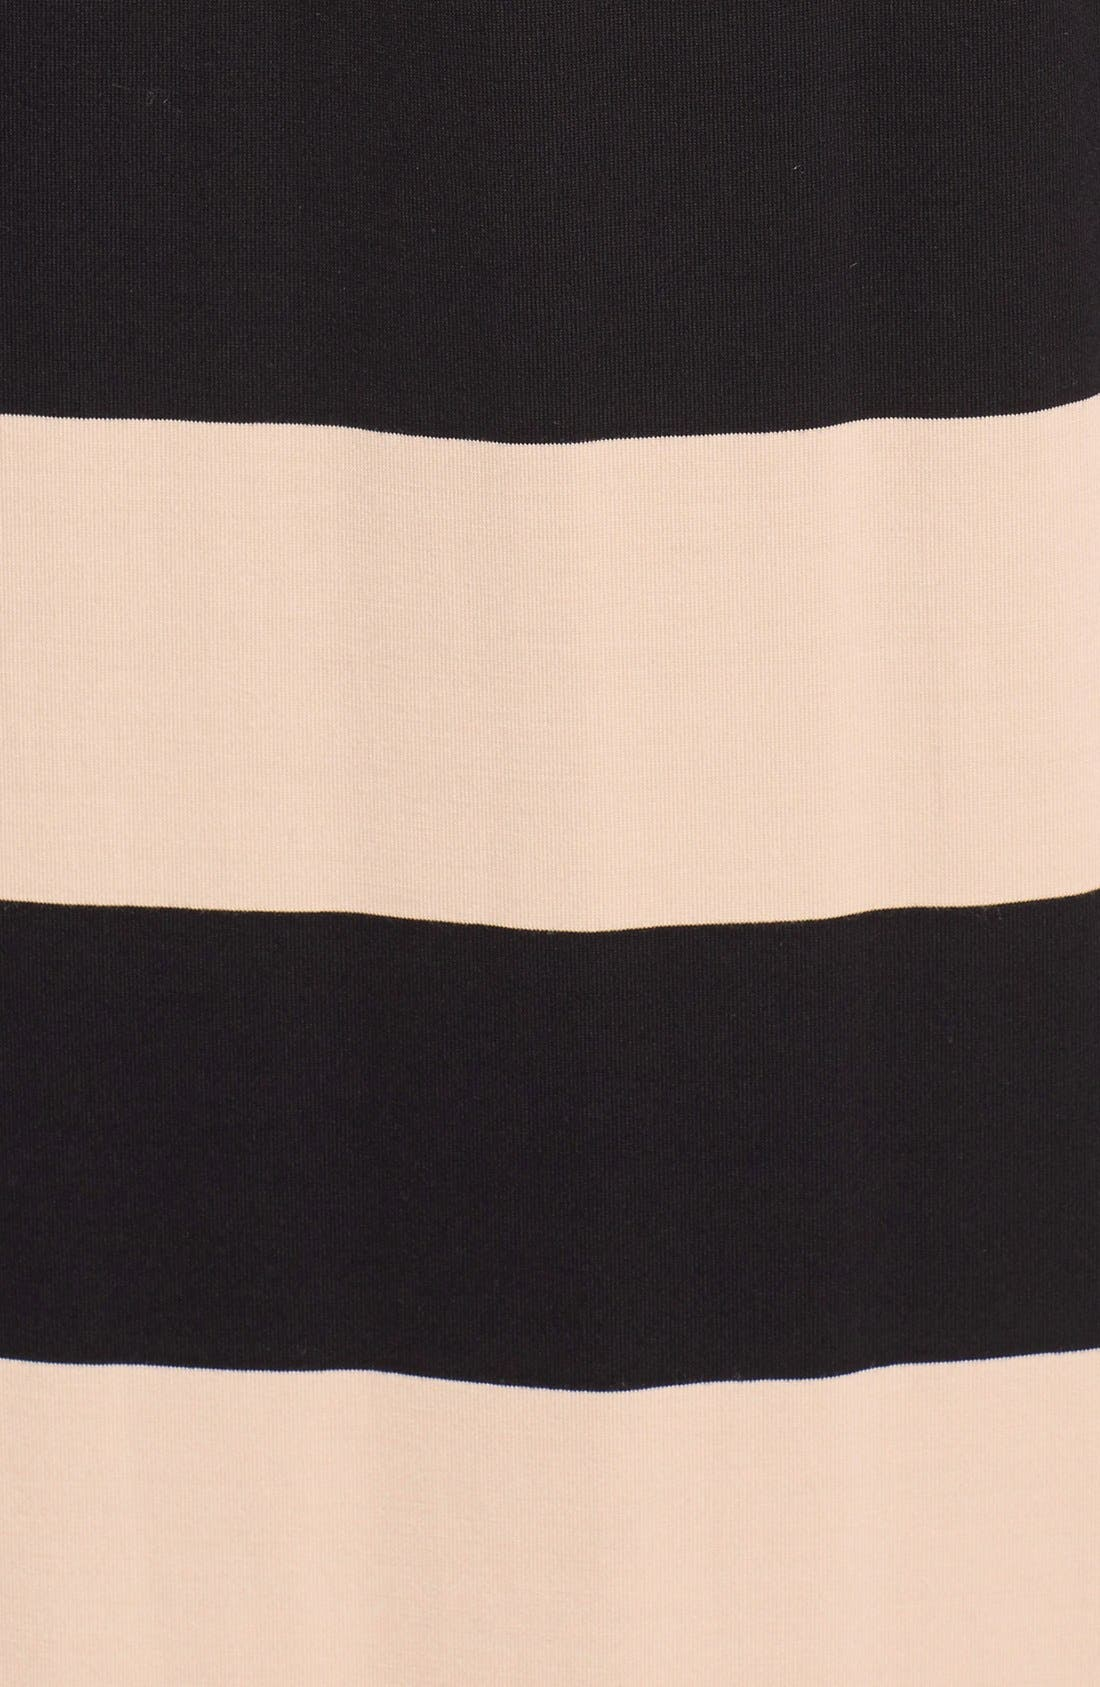 Alternate Image 3  - Felicity & Coco Blouson Stripe Maxi Dress (Nordstrom Exclusive)